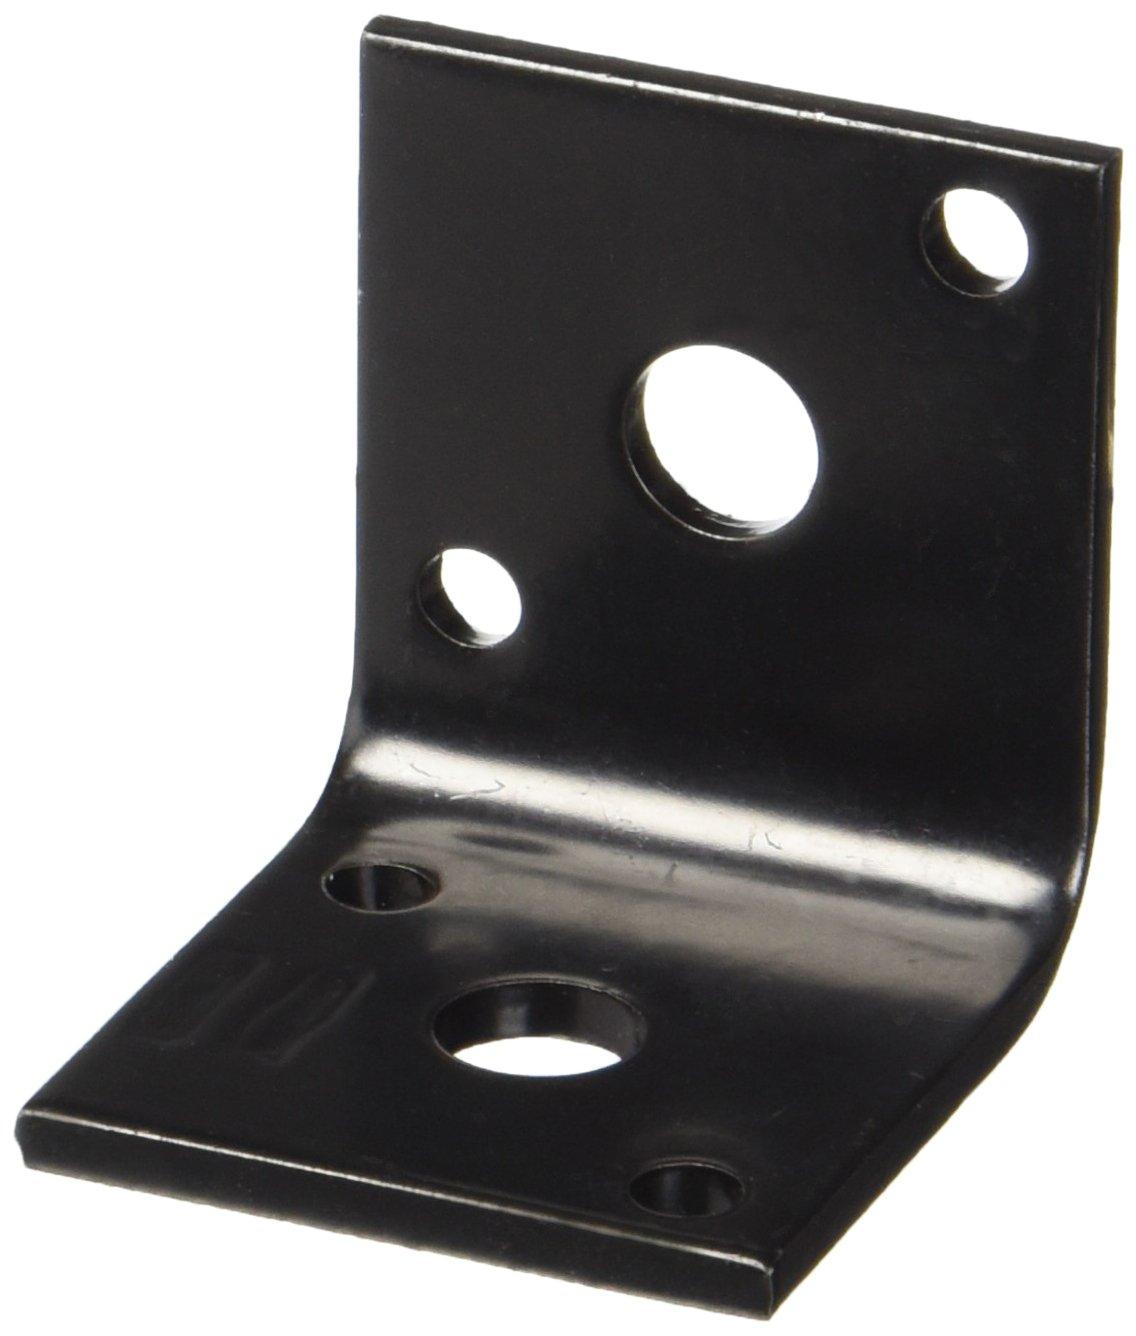 NATIONAL MFG SPECTRUM BRANDS HHI N351 482 351482 Corner Brace 1.65 Inch Black